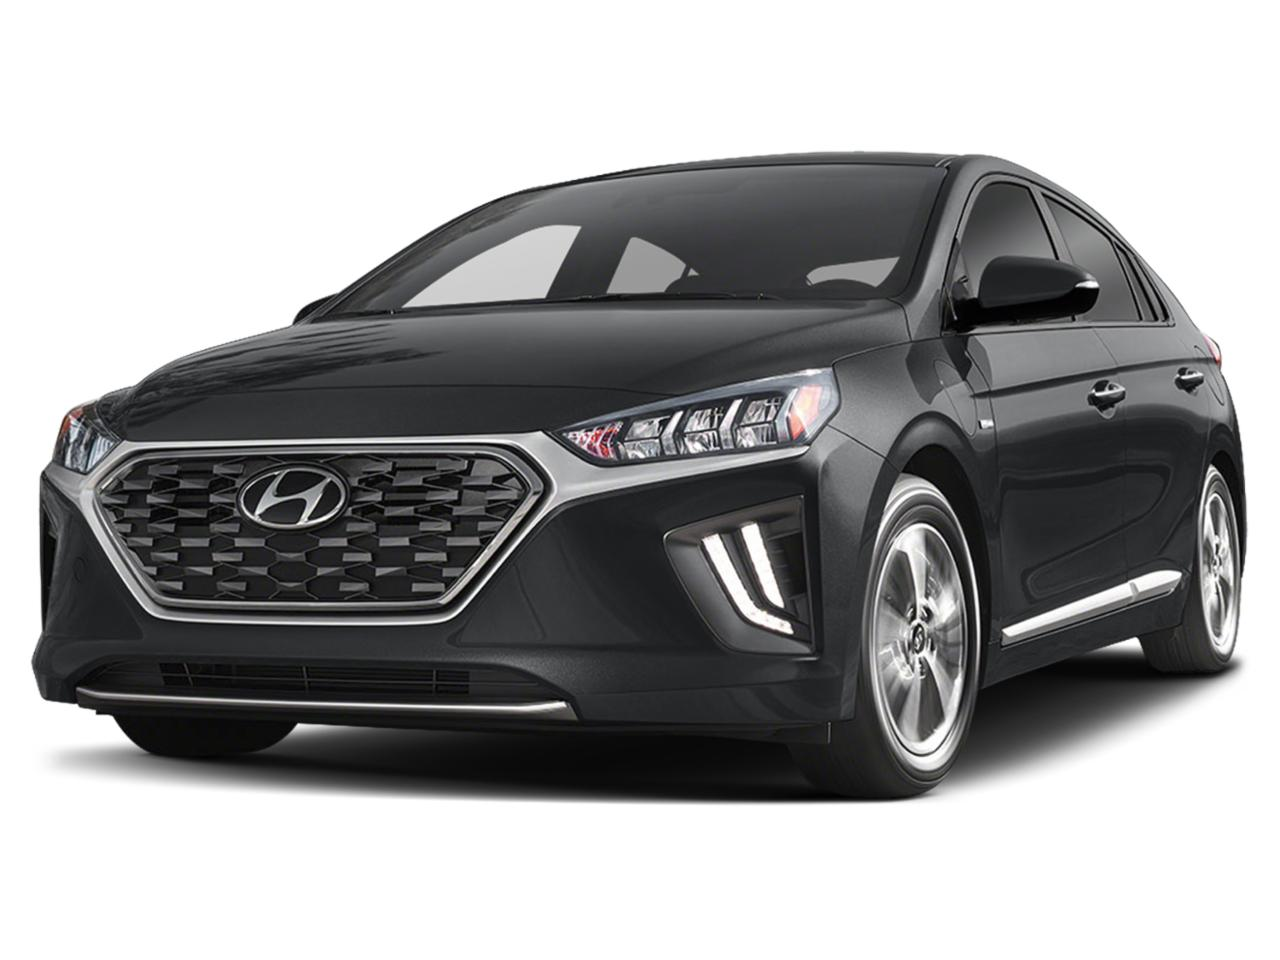 2020 Hyundai IONIQ Plug-In Hybrid Vehicle Photo in Appleton, WI 54913